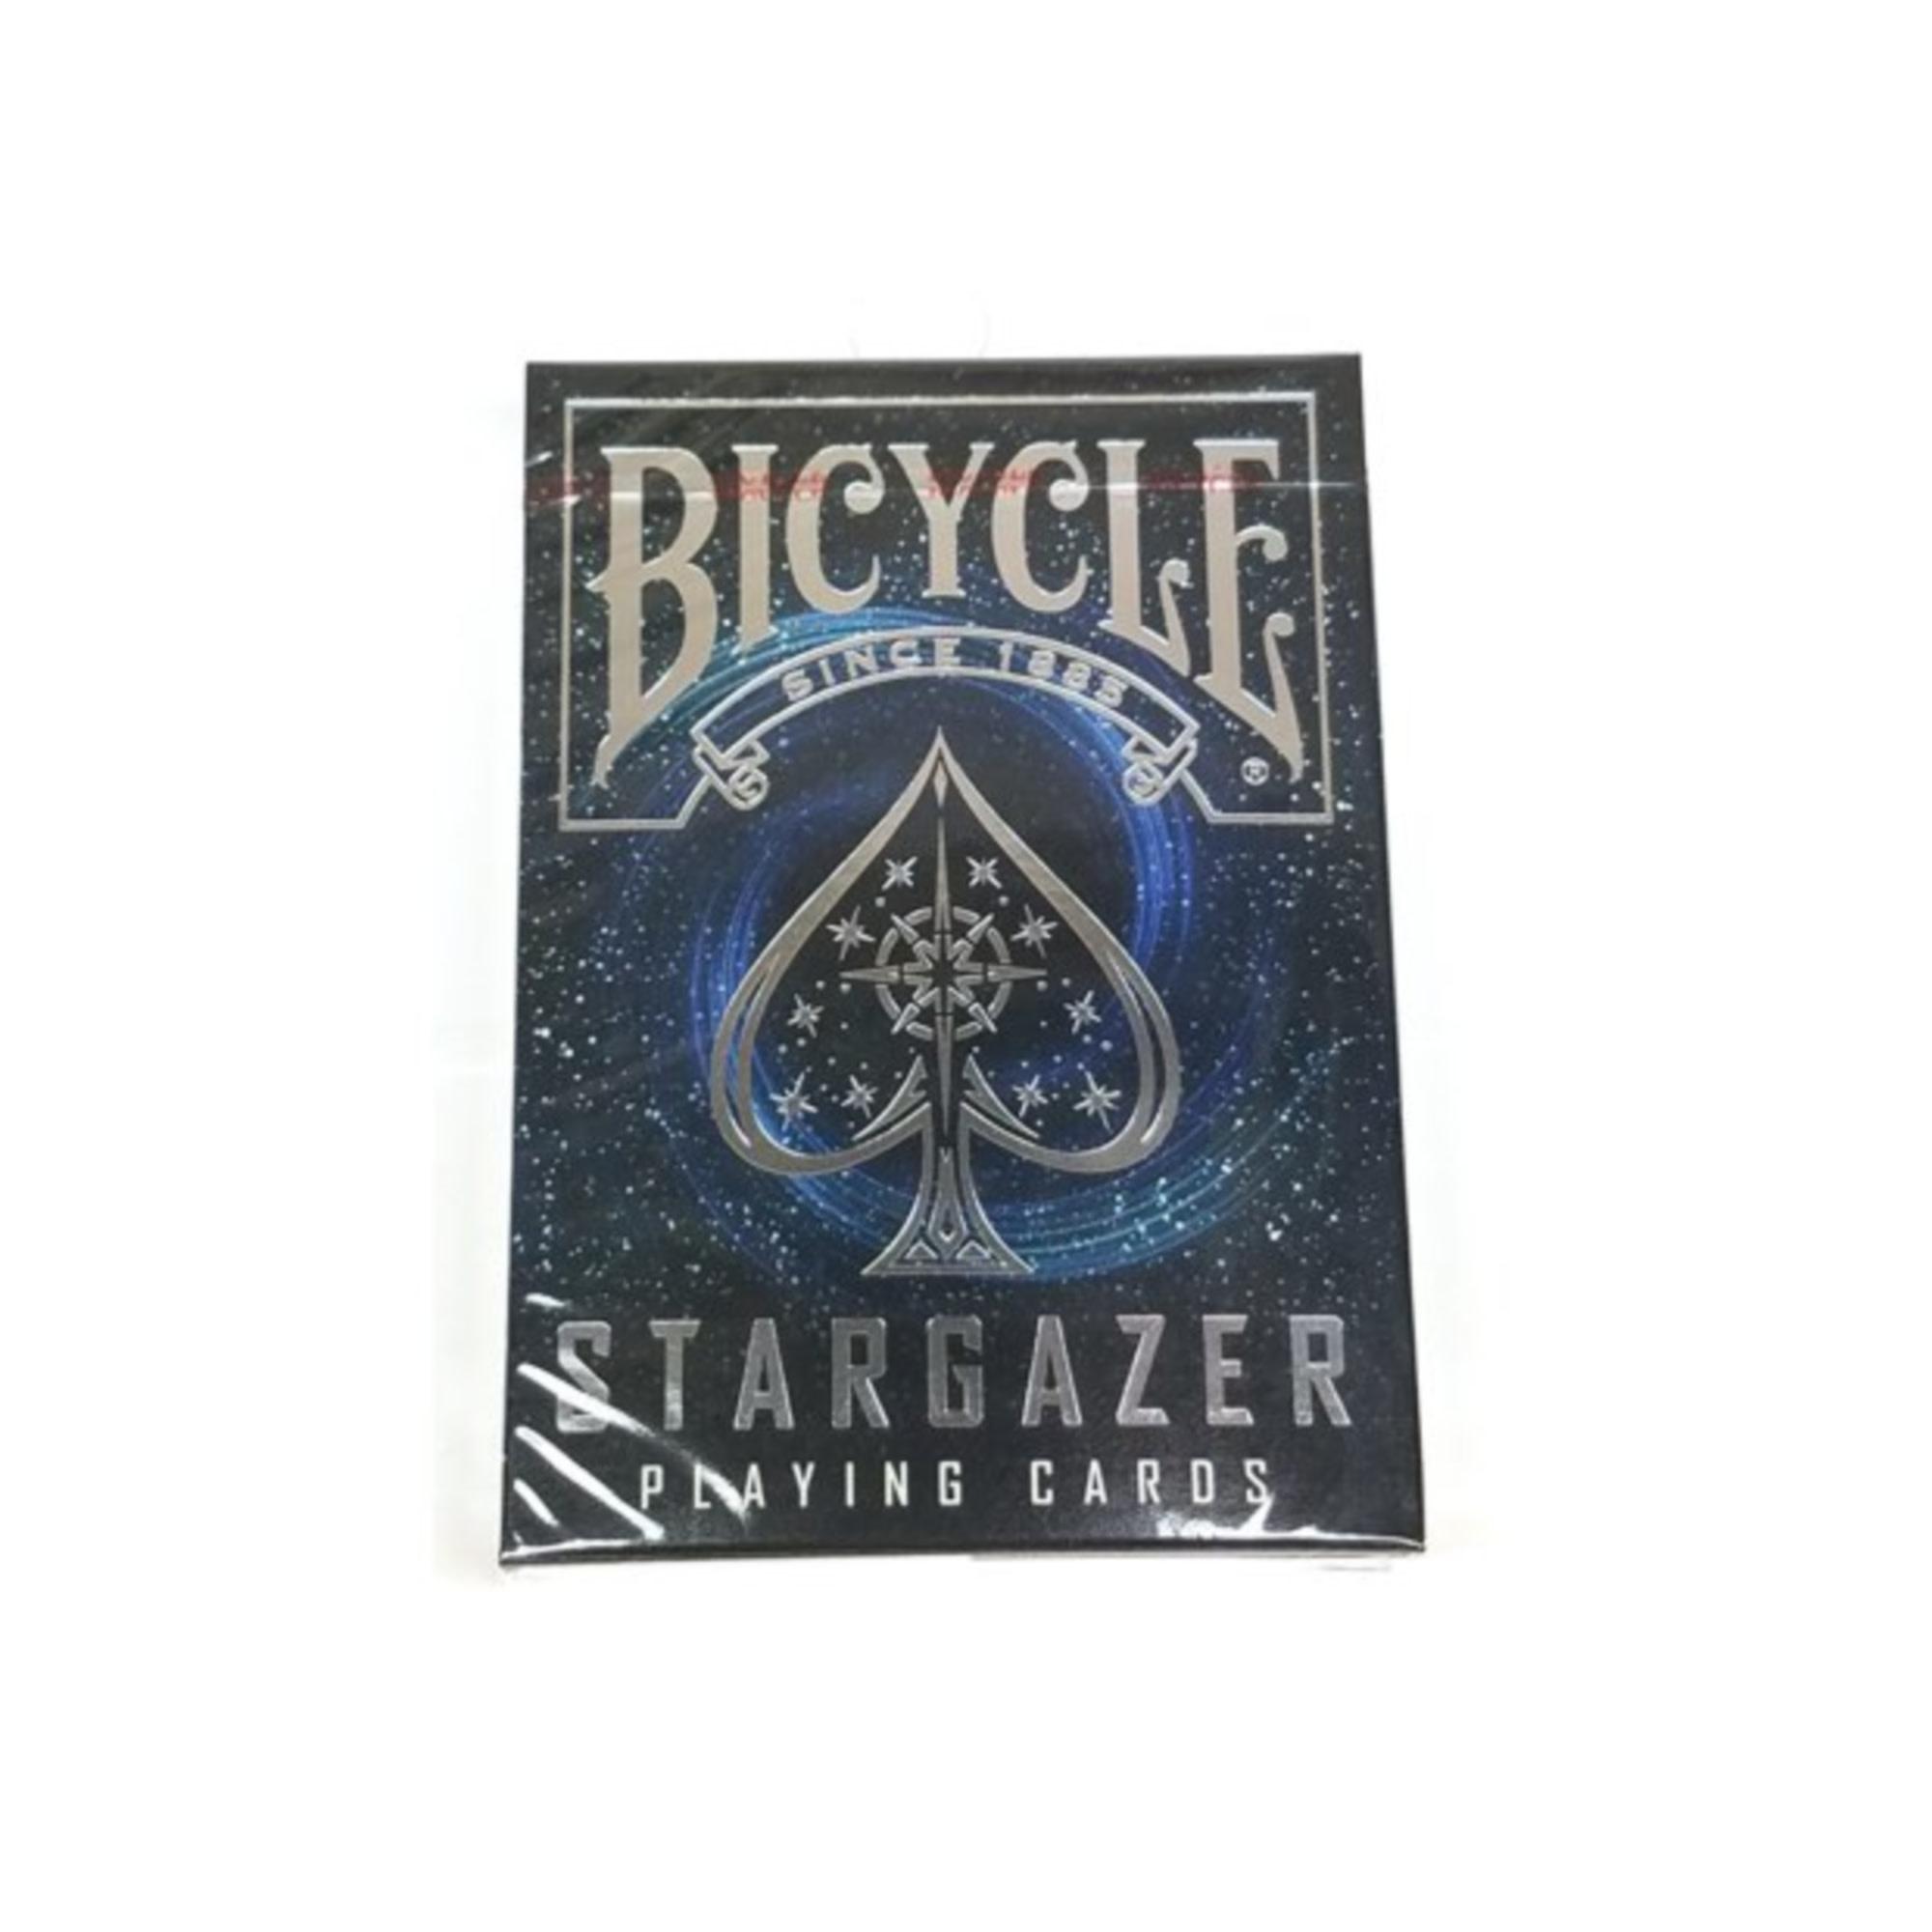 Bicycle Bicycle - Stargazer